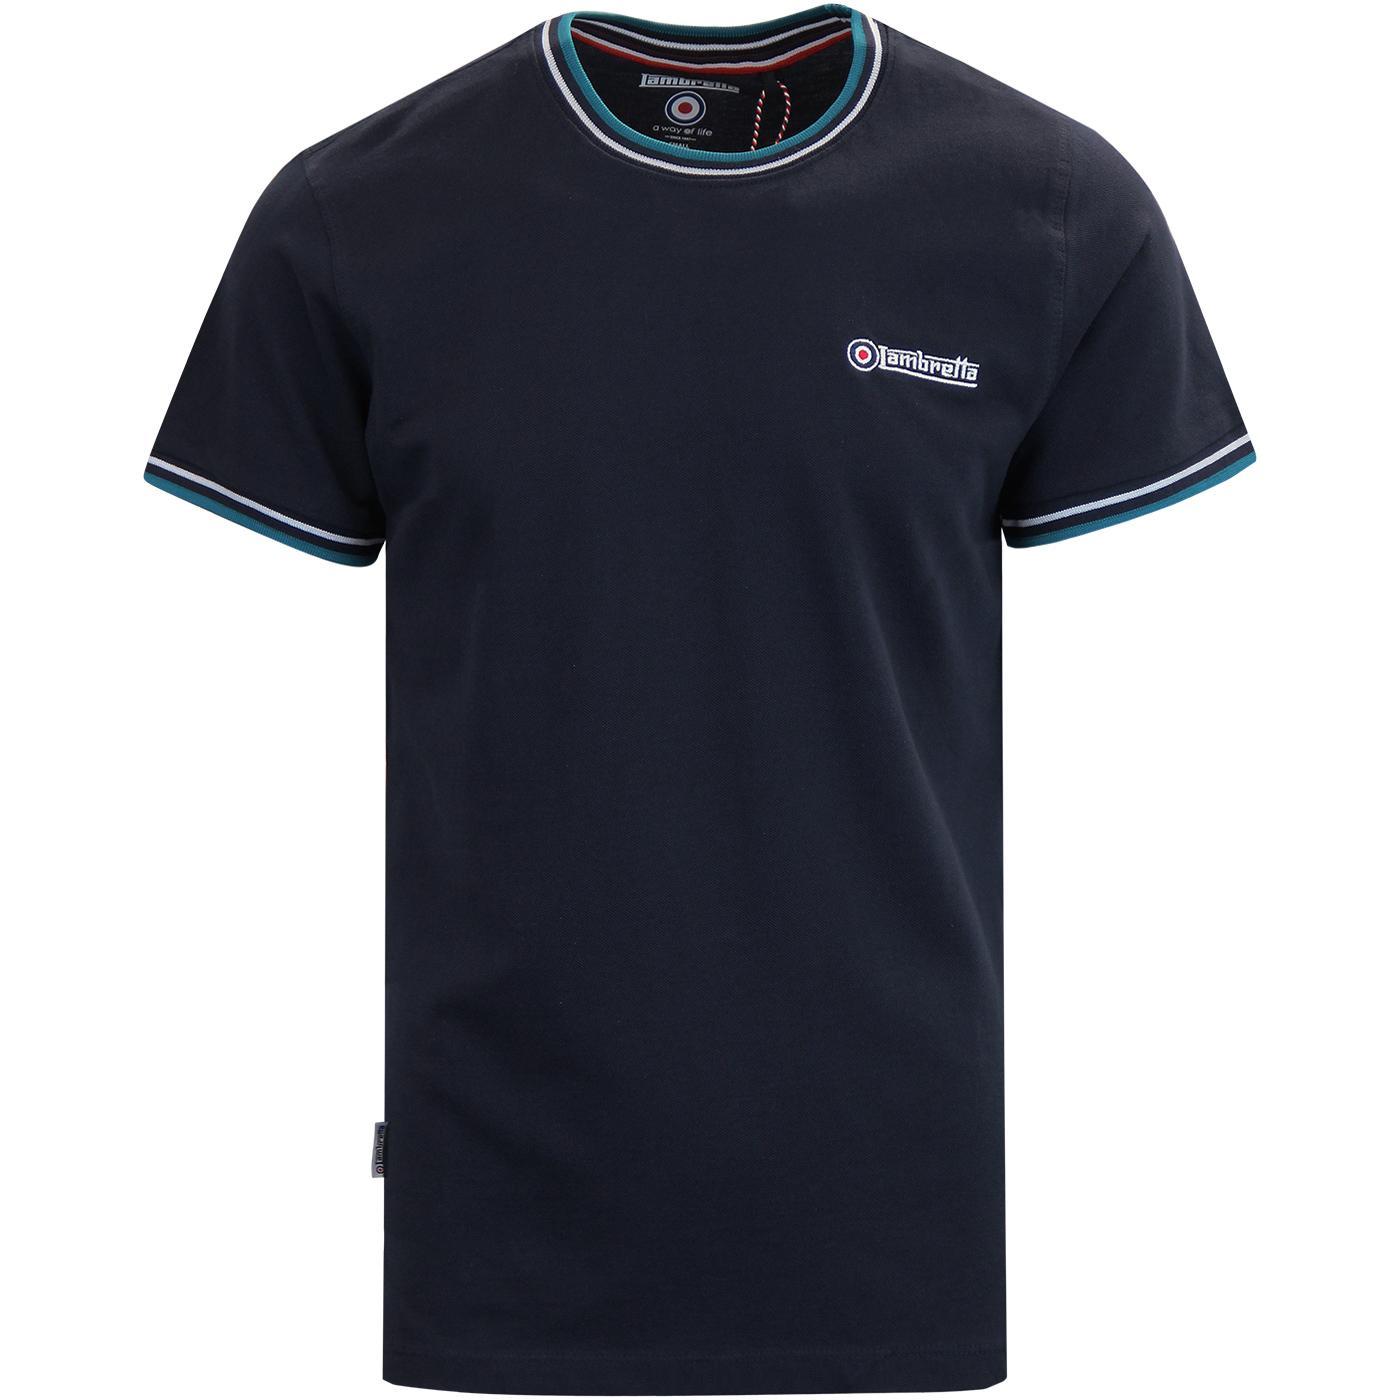 LAMBRETTA Men's Retro Tipped Pique T-shirt NAVY